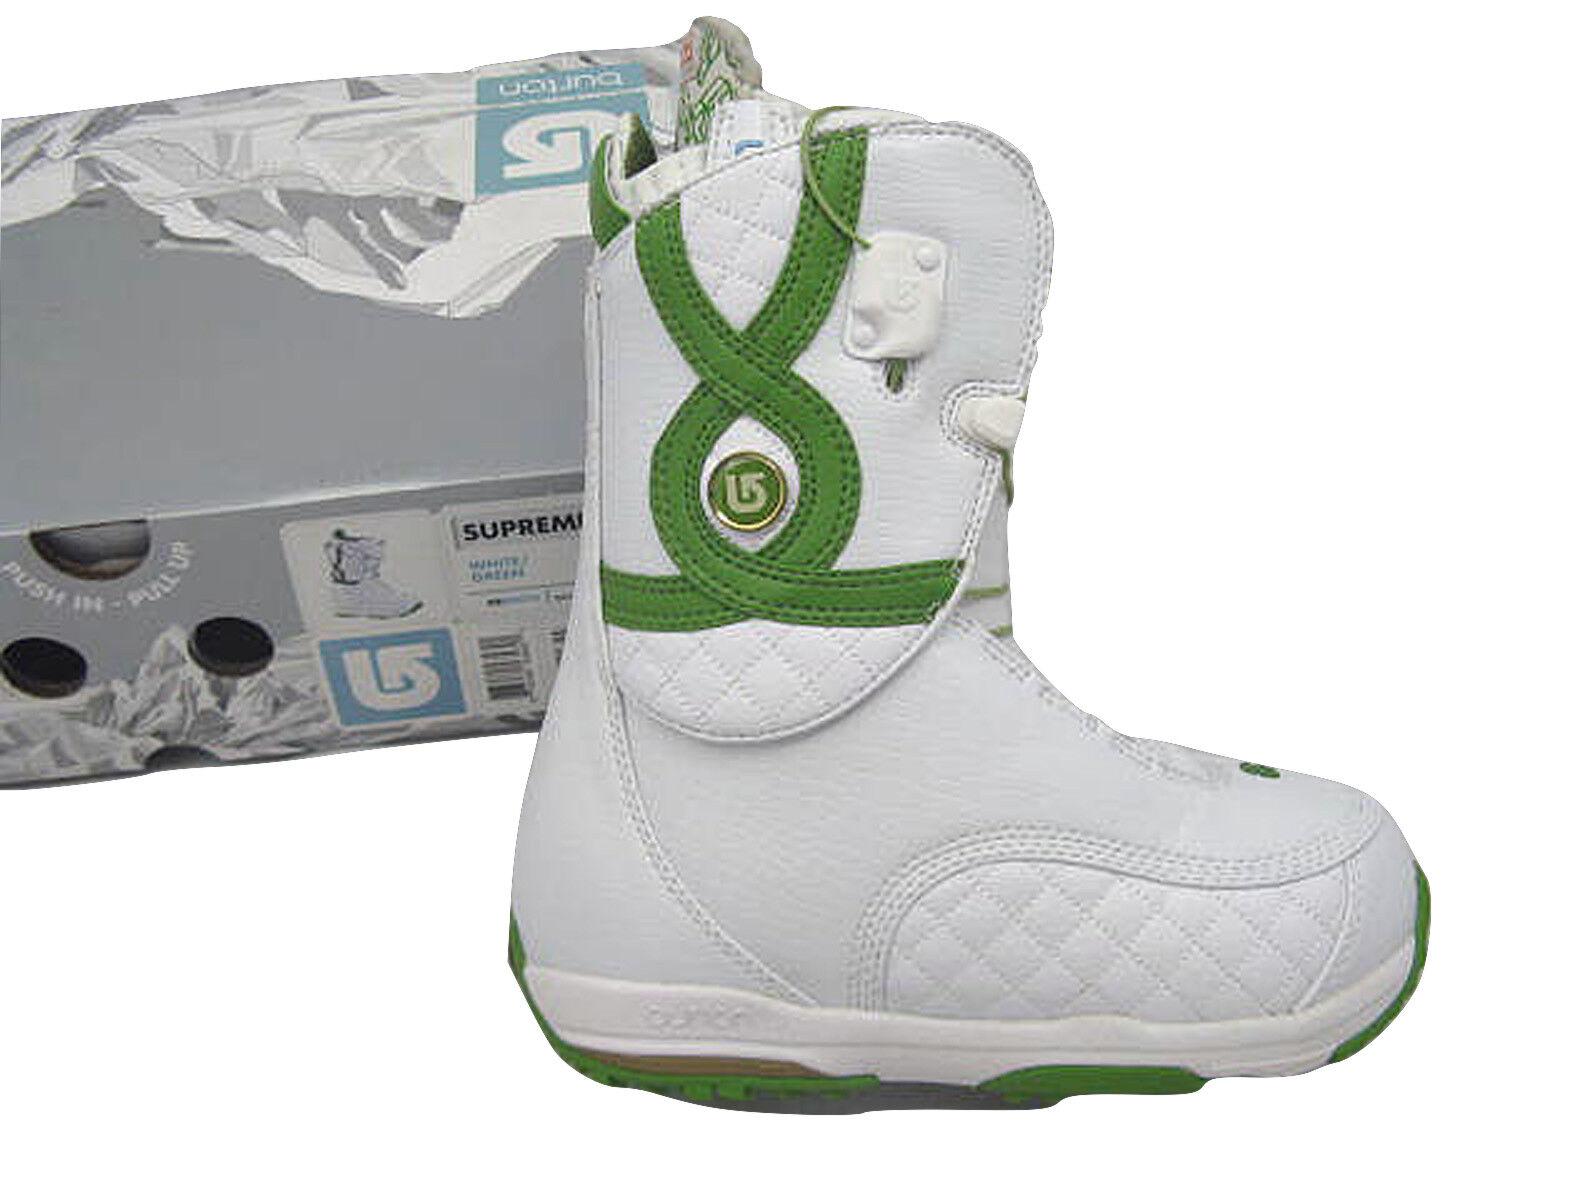 NEW  330 Burton Supreme Snowboard Boots   US 4 Euro 34 Mondo 21  WHITE